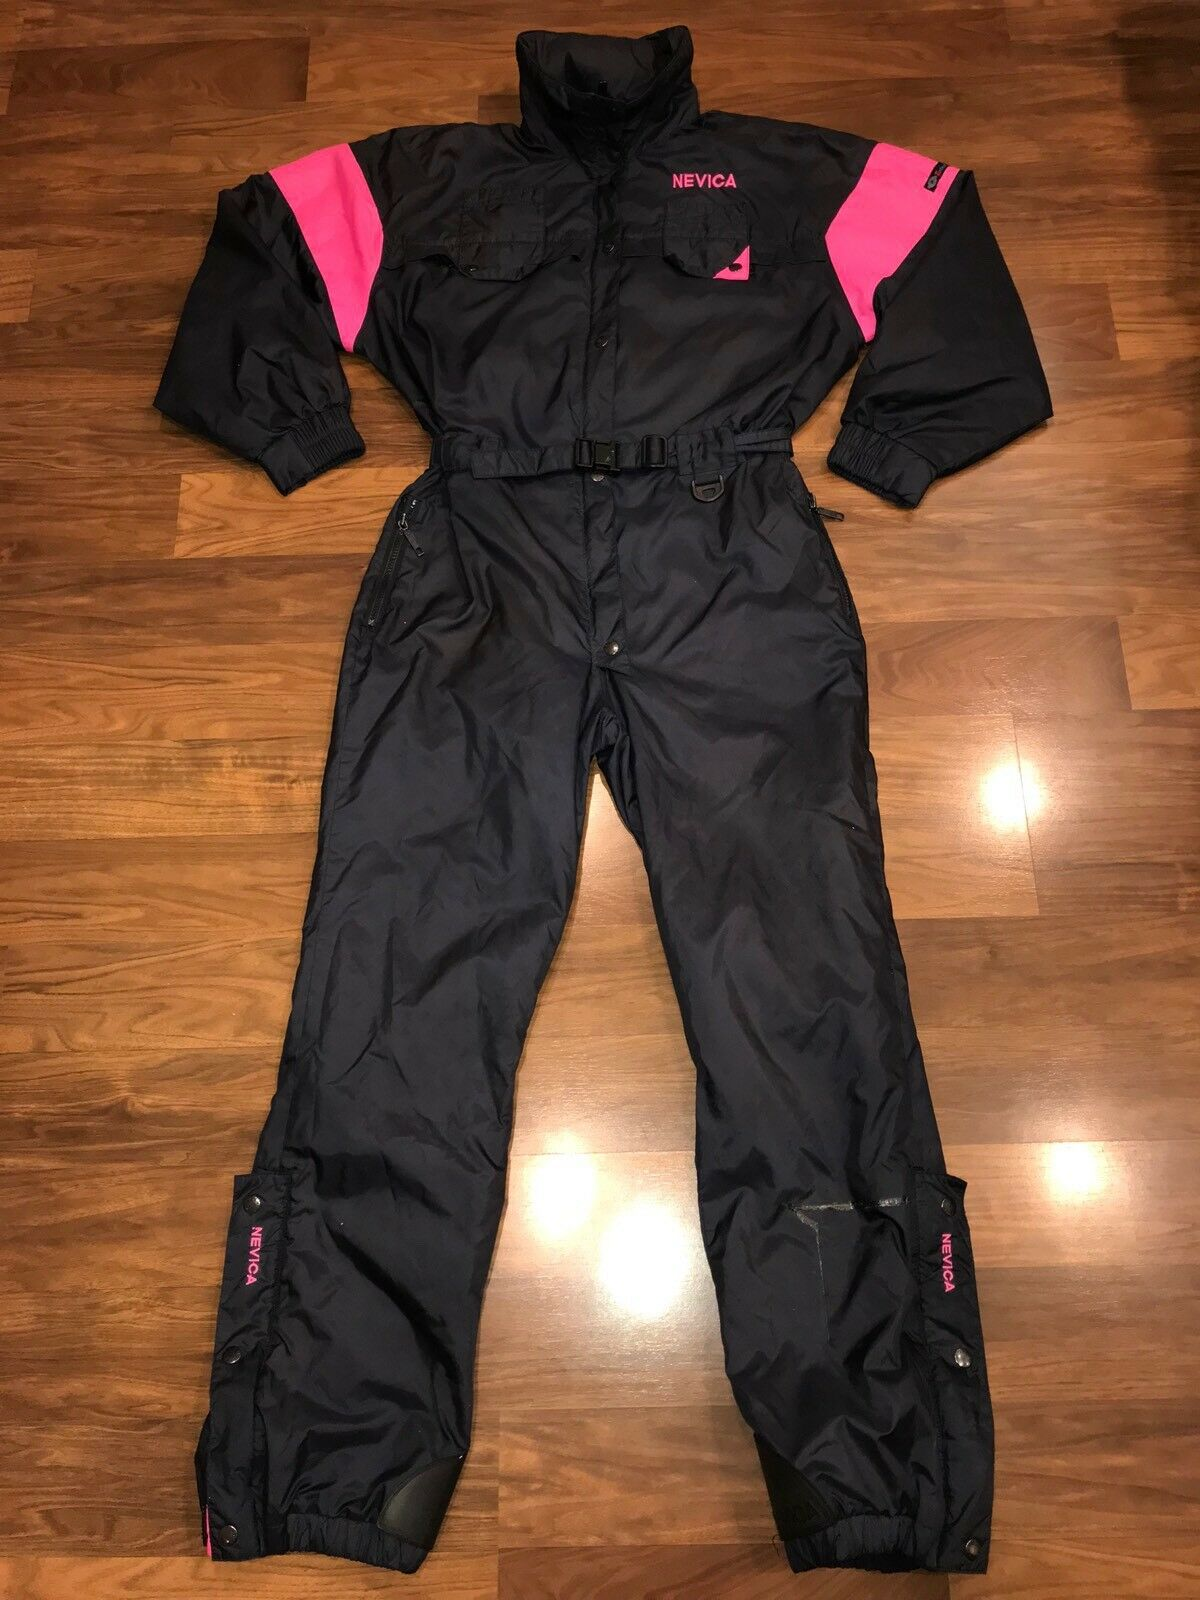 Vtg 80s 90s Navy NEVICA Herren SMALL One Piece SKI SUIT Snow Bib Neon Snowsuit S